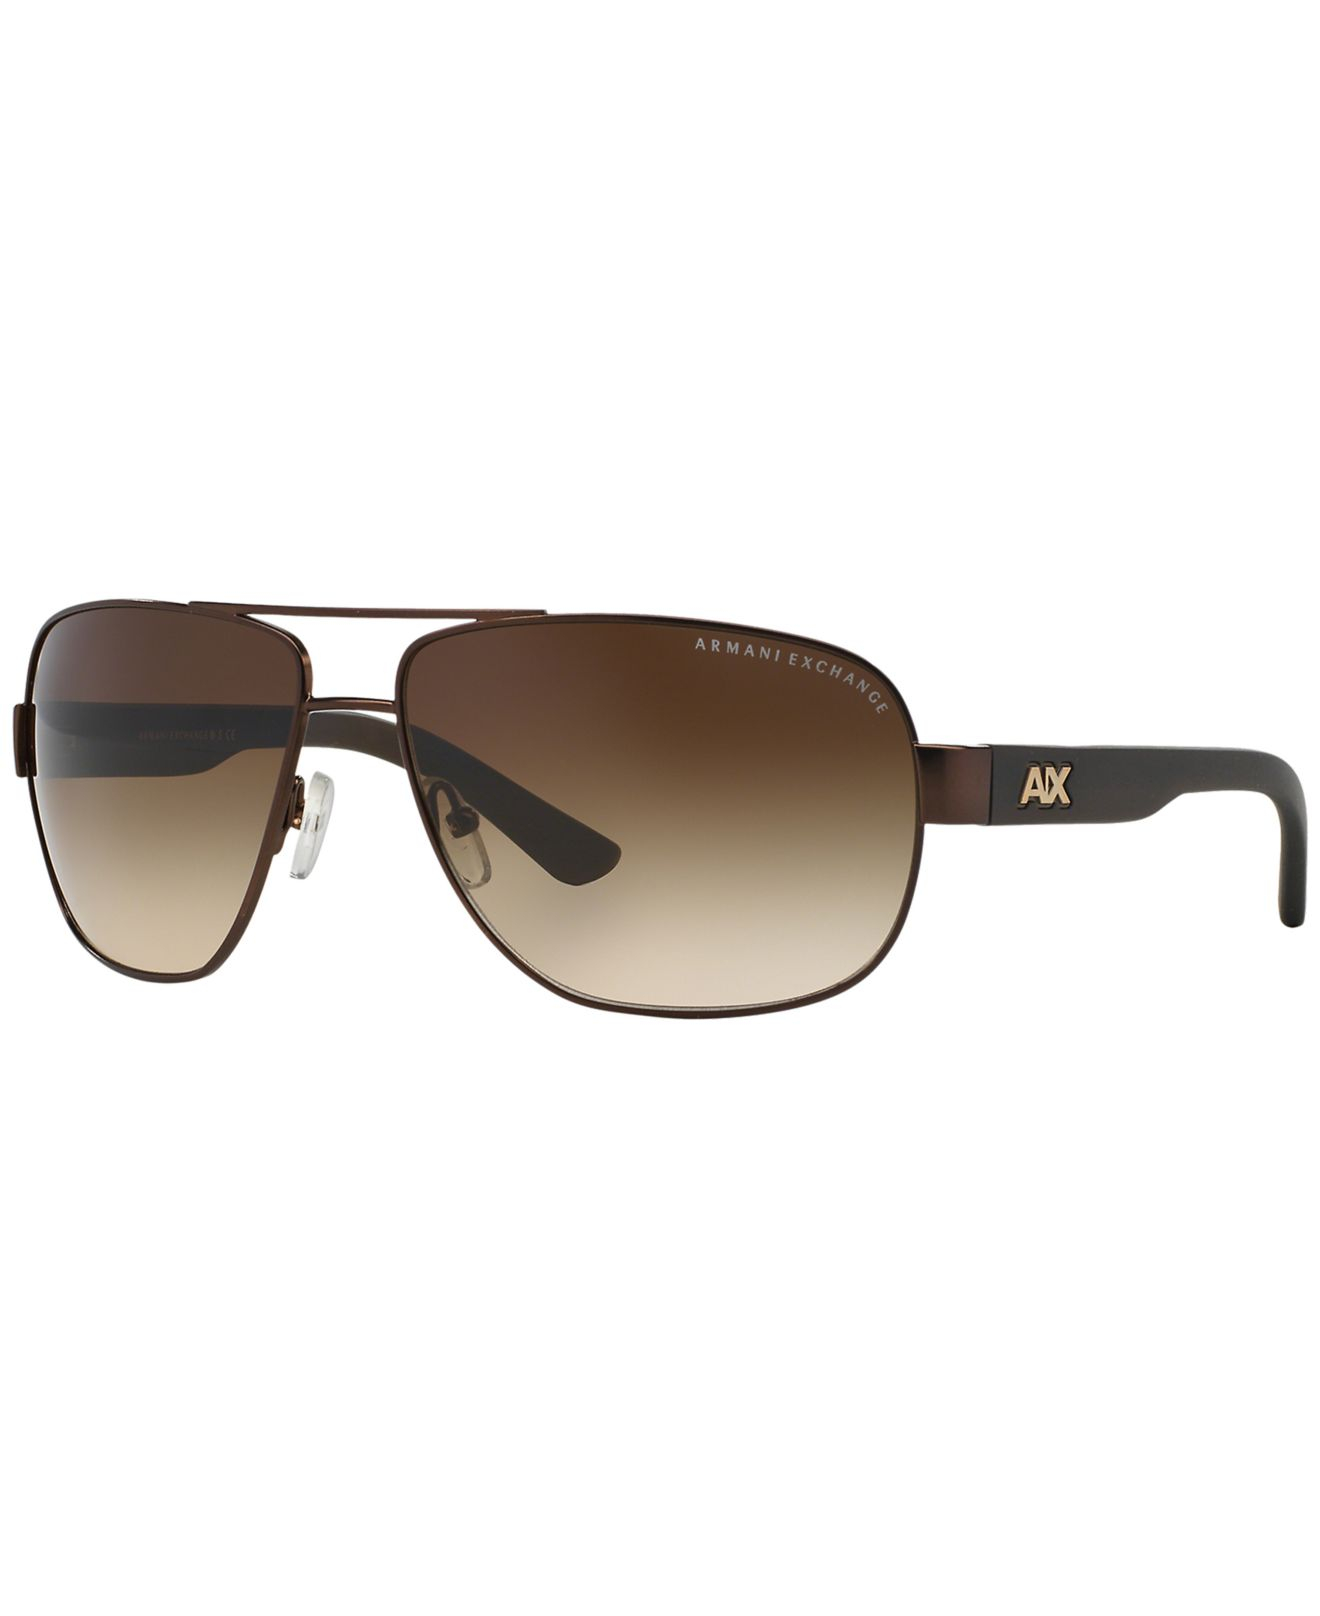 1b21cab6478 Armani Exchange Ax 139 s Aviator Sunglasses